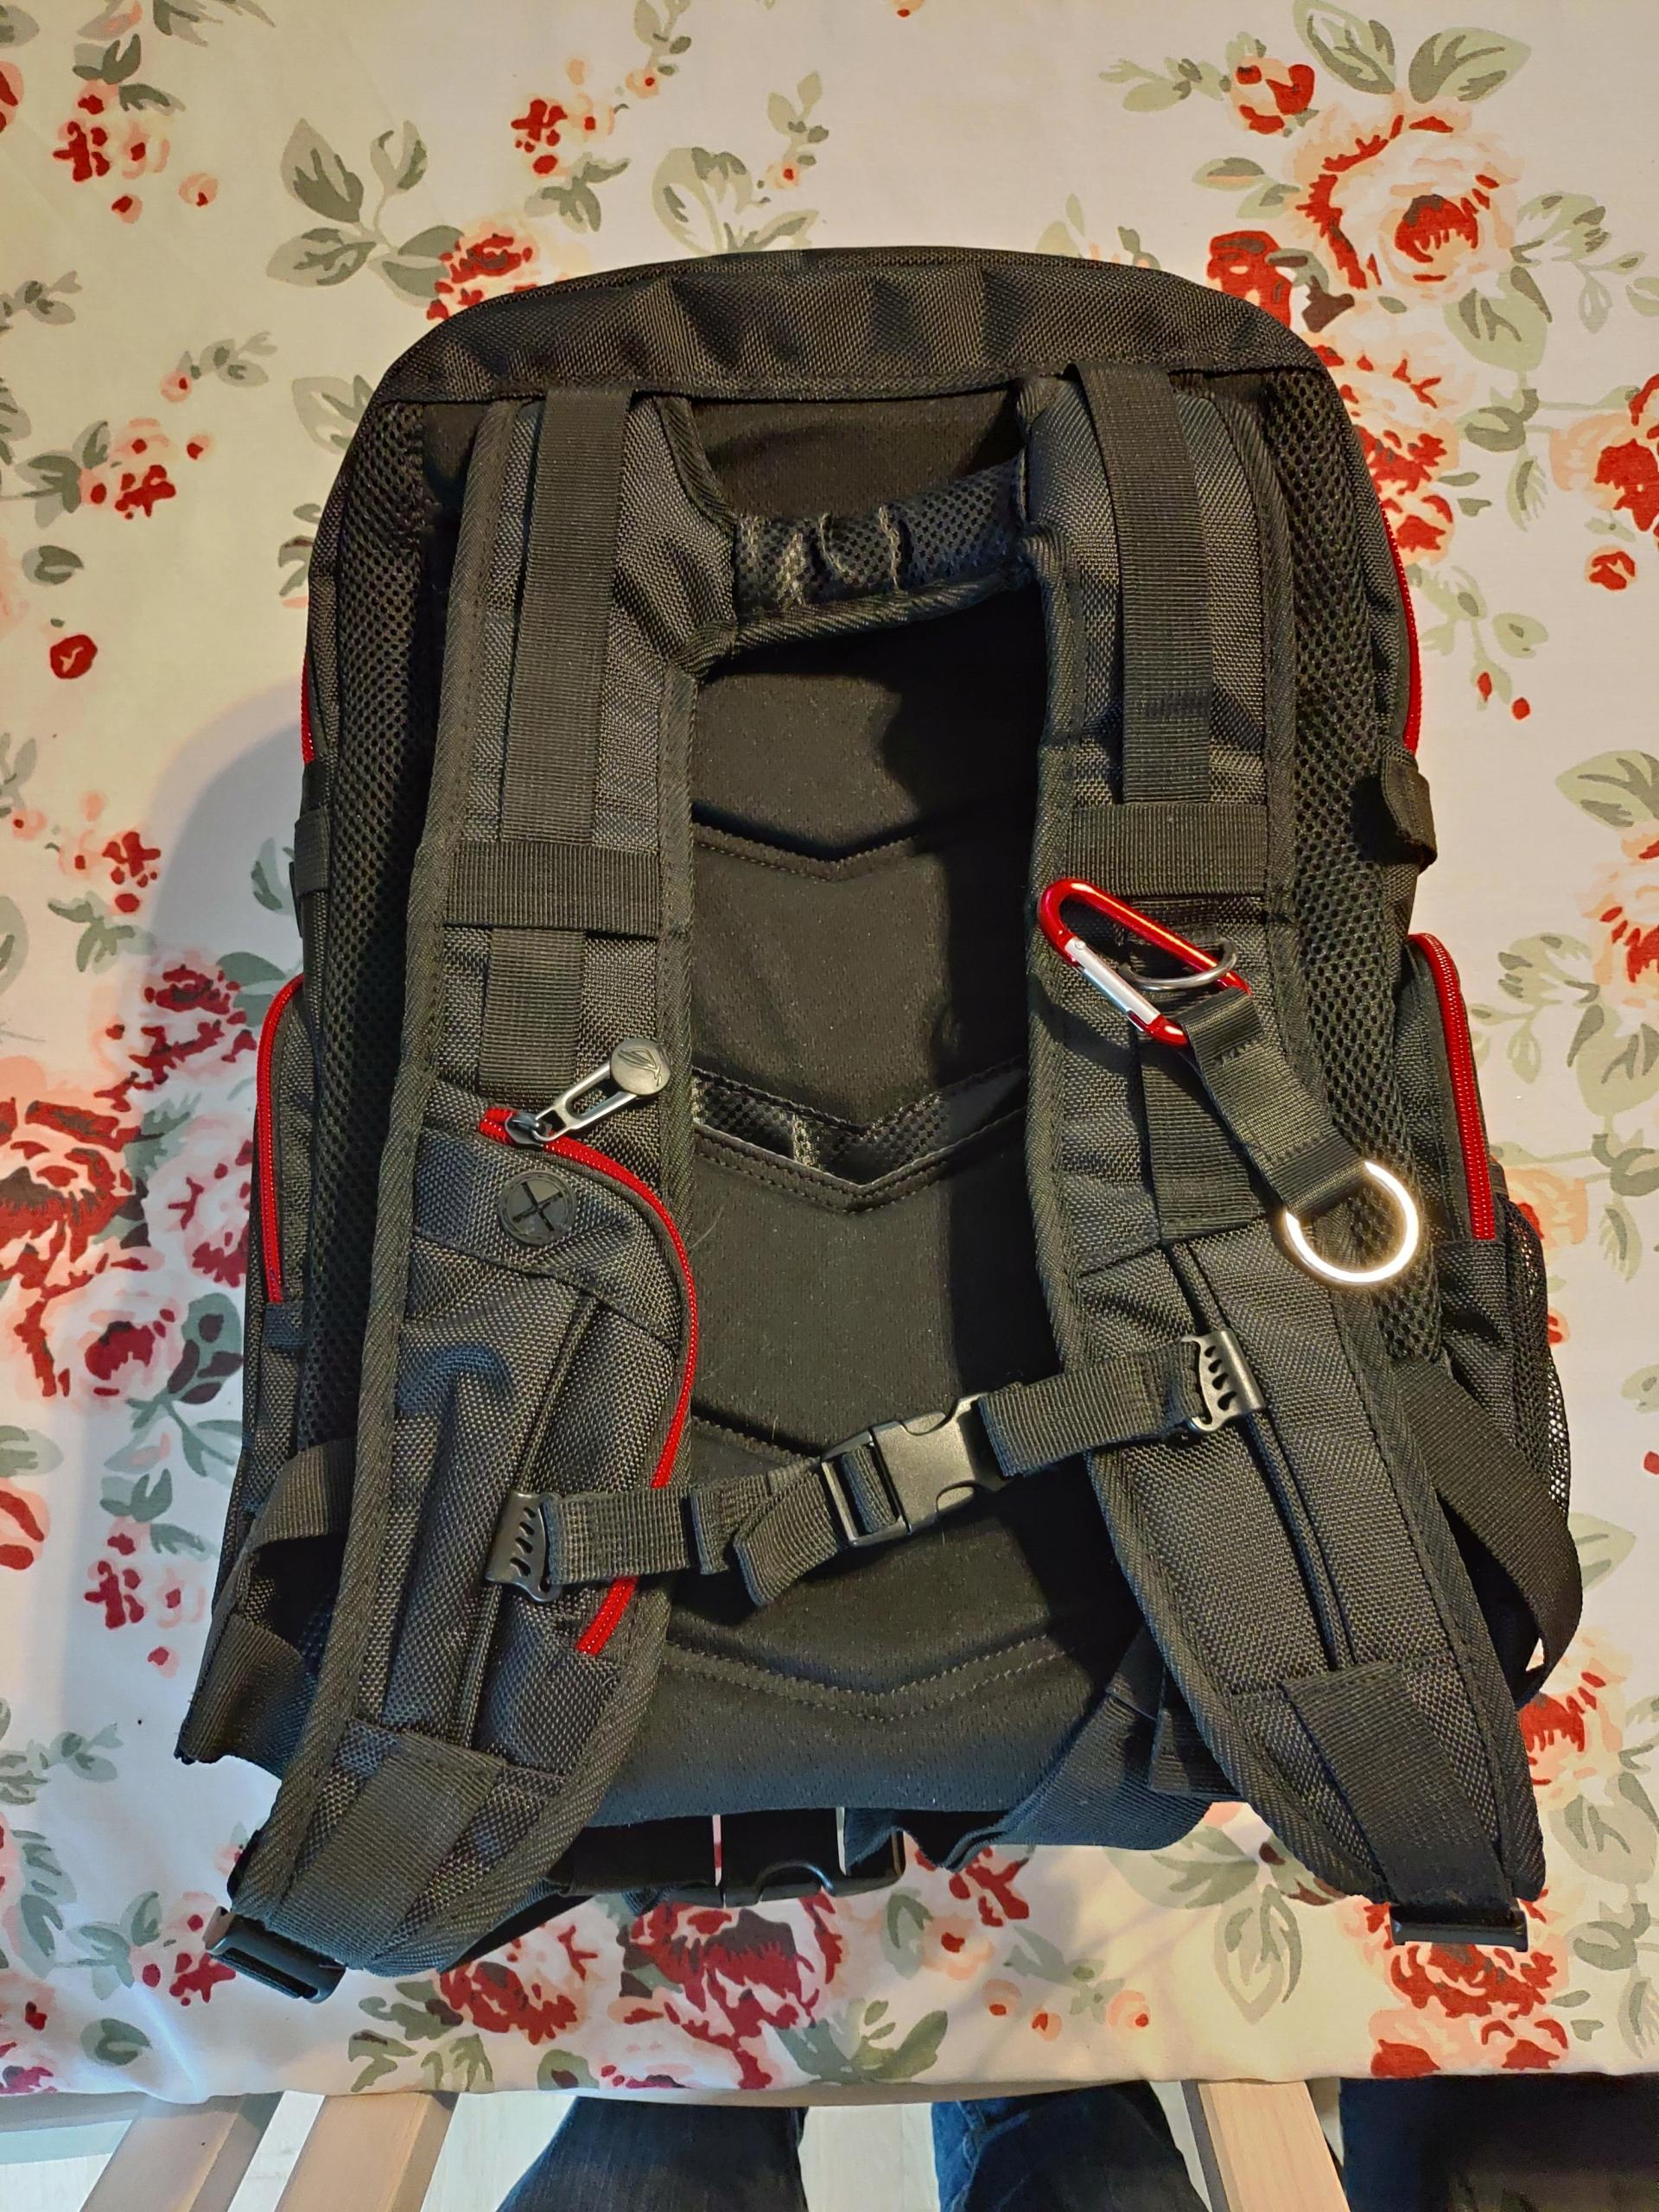 5d43d34db388c ASUS ROG Nomad - Plecak Laptop 17.3 cala - 7704766986 - oficjalne ...